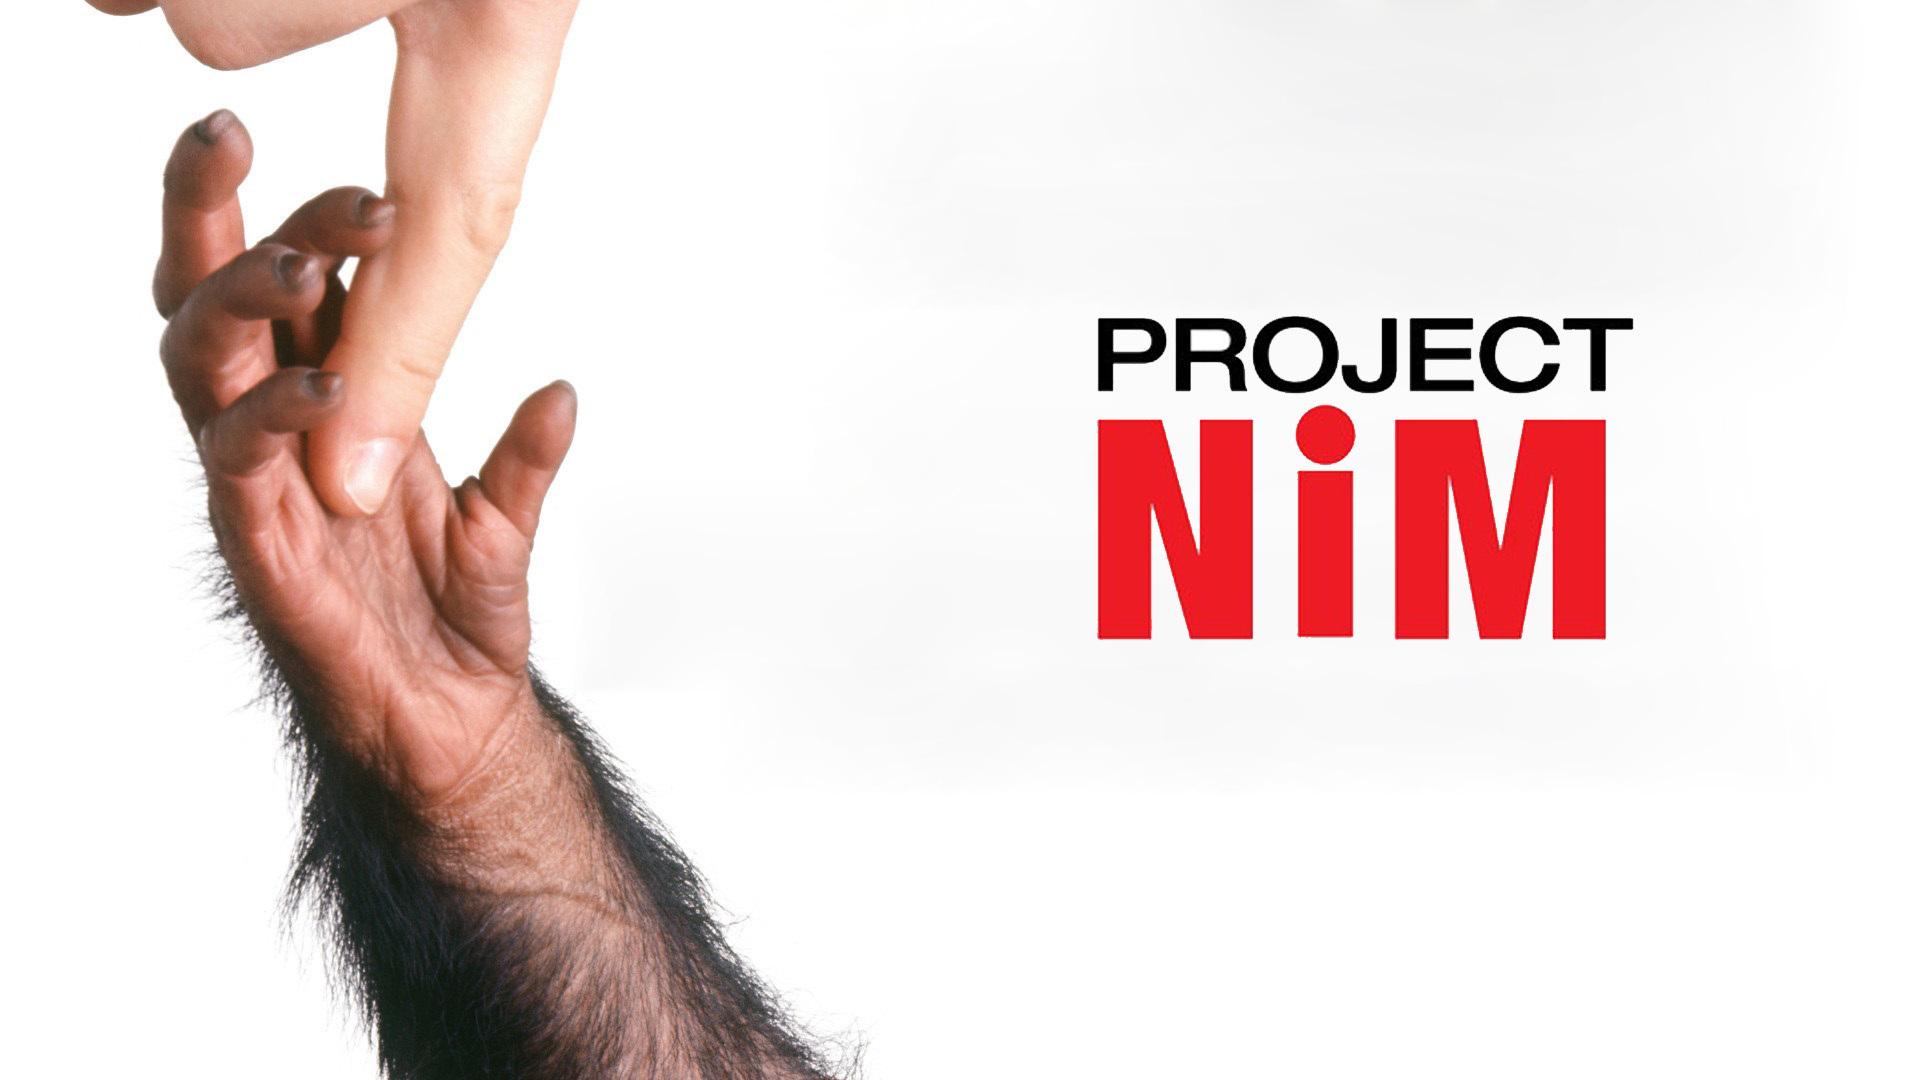 Проект «Ним» смотреть фото